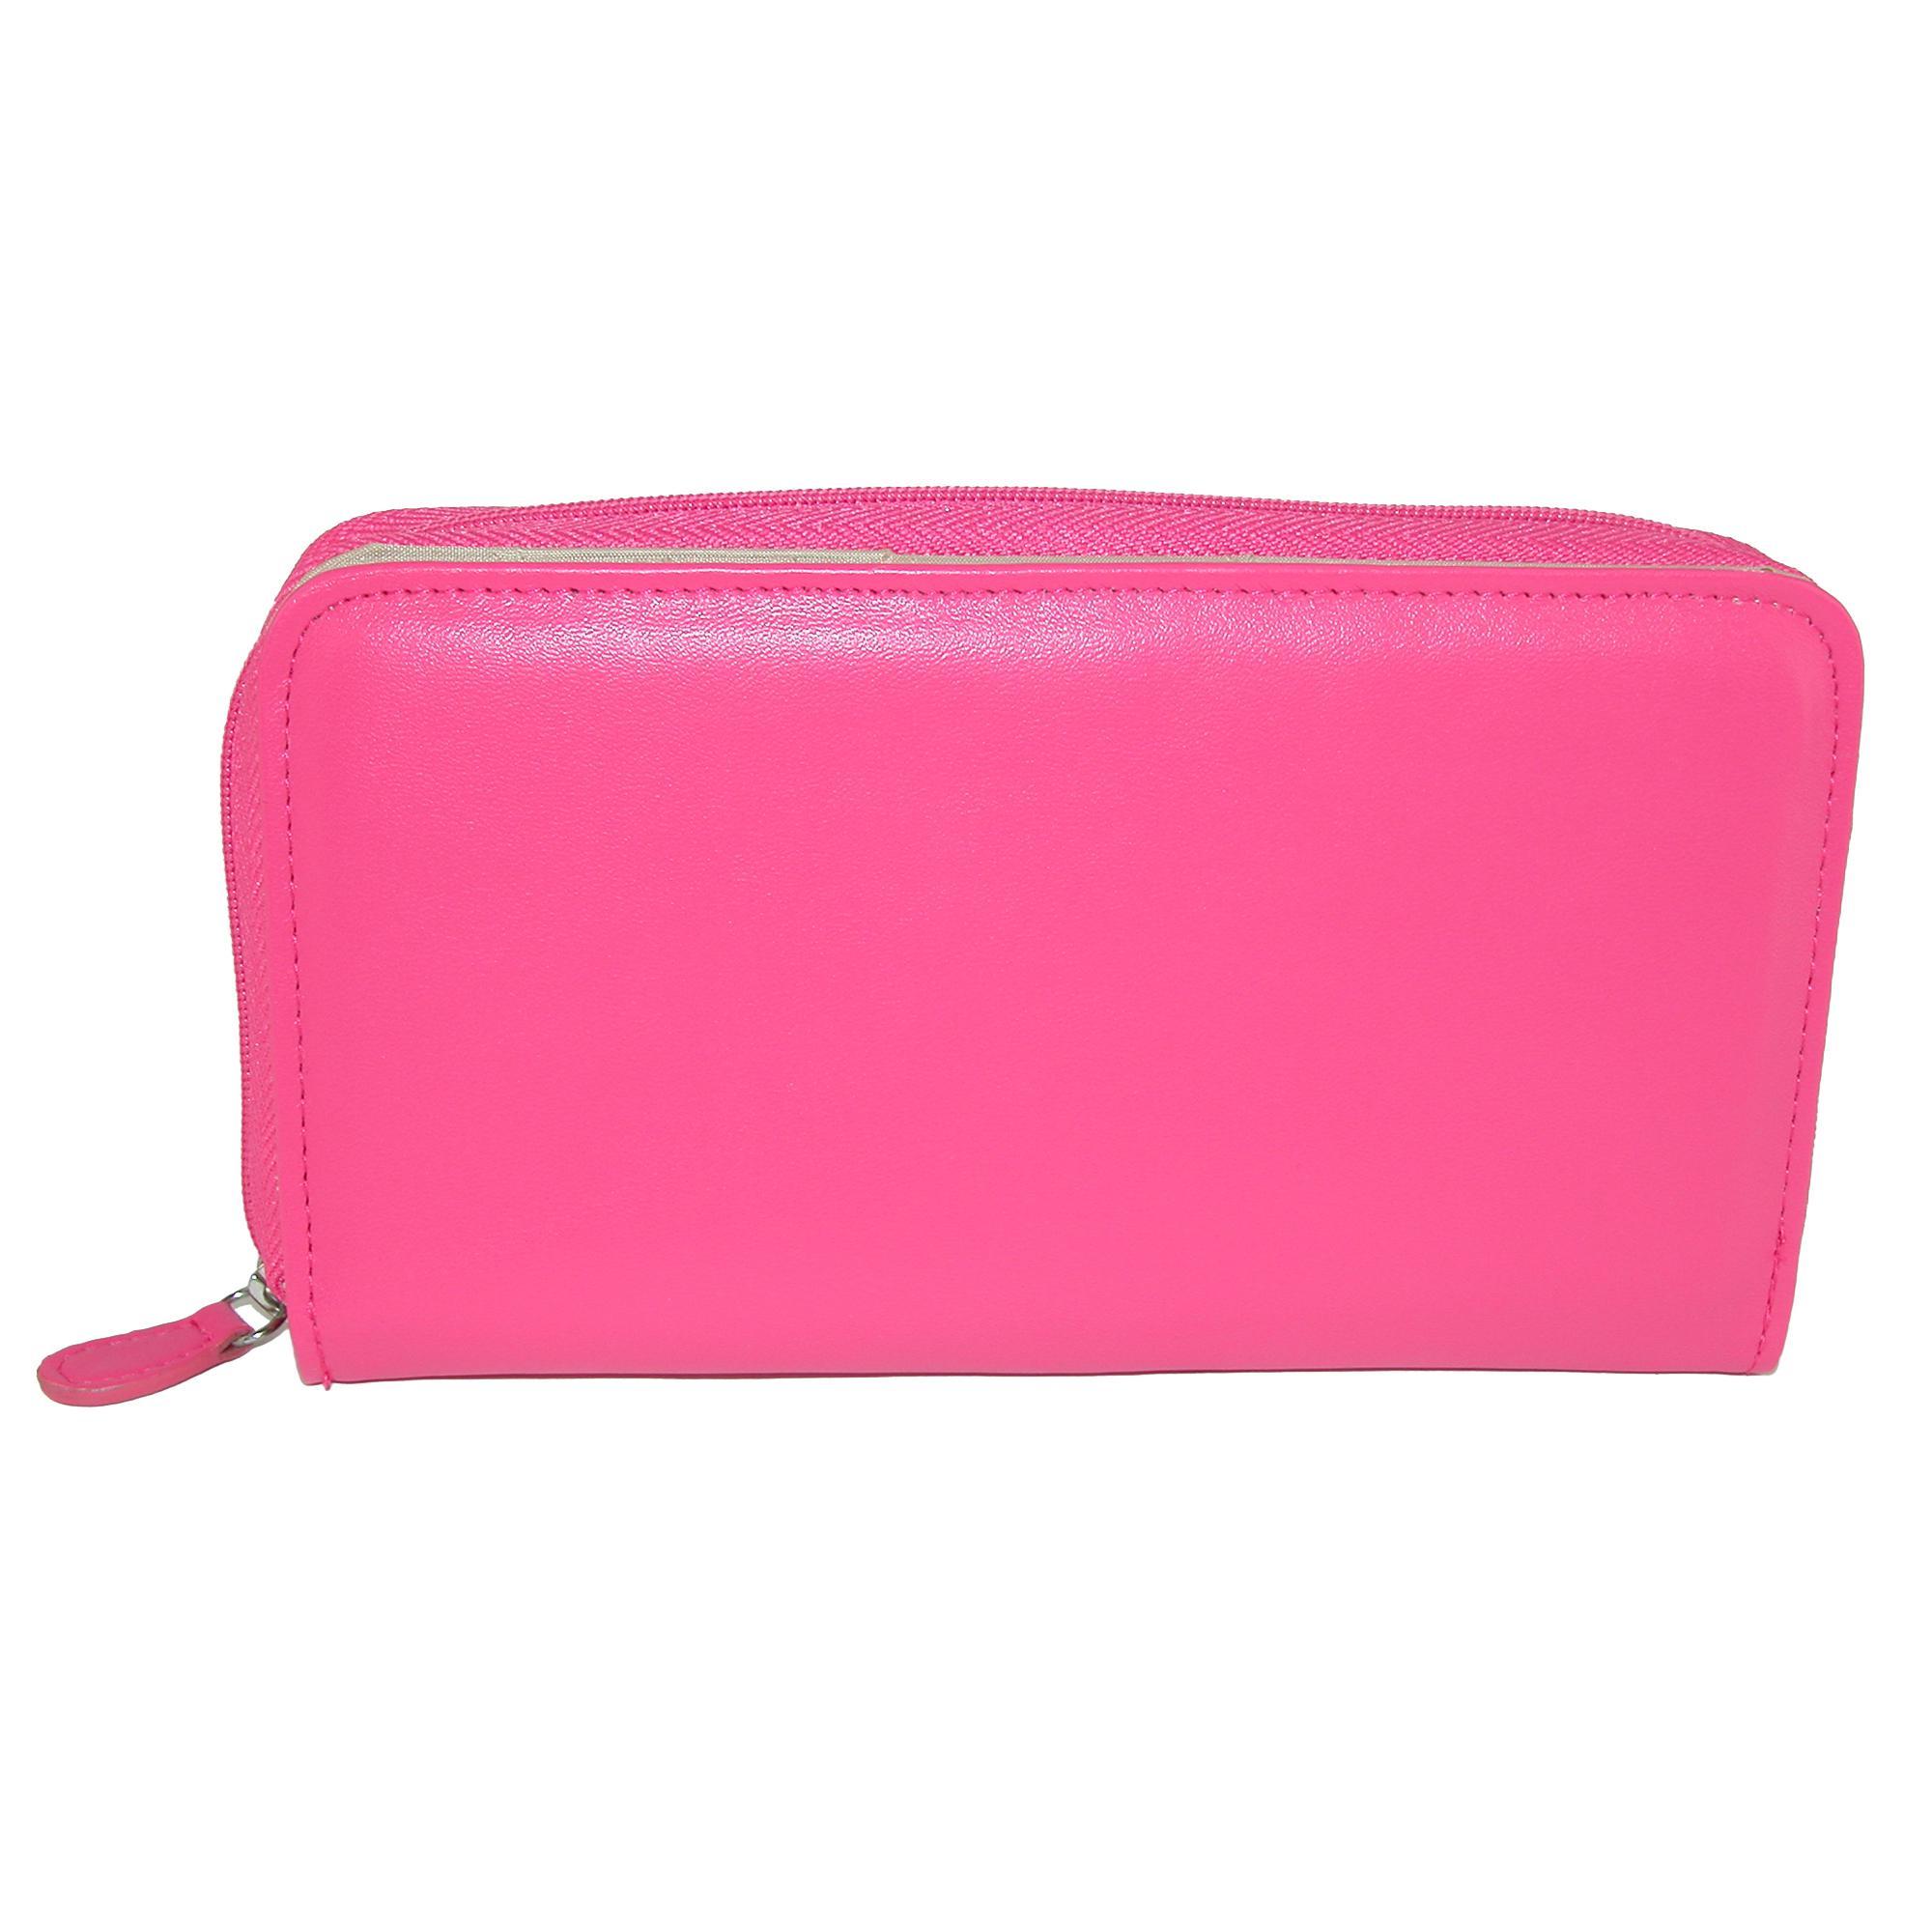 db design Women's Solid Color Coupon Organizer Wallet